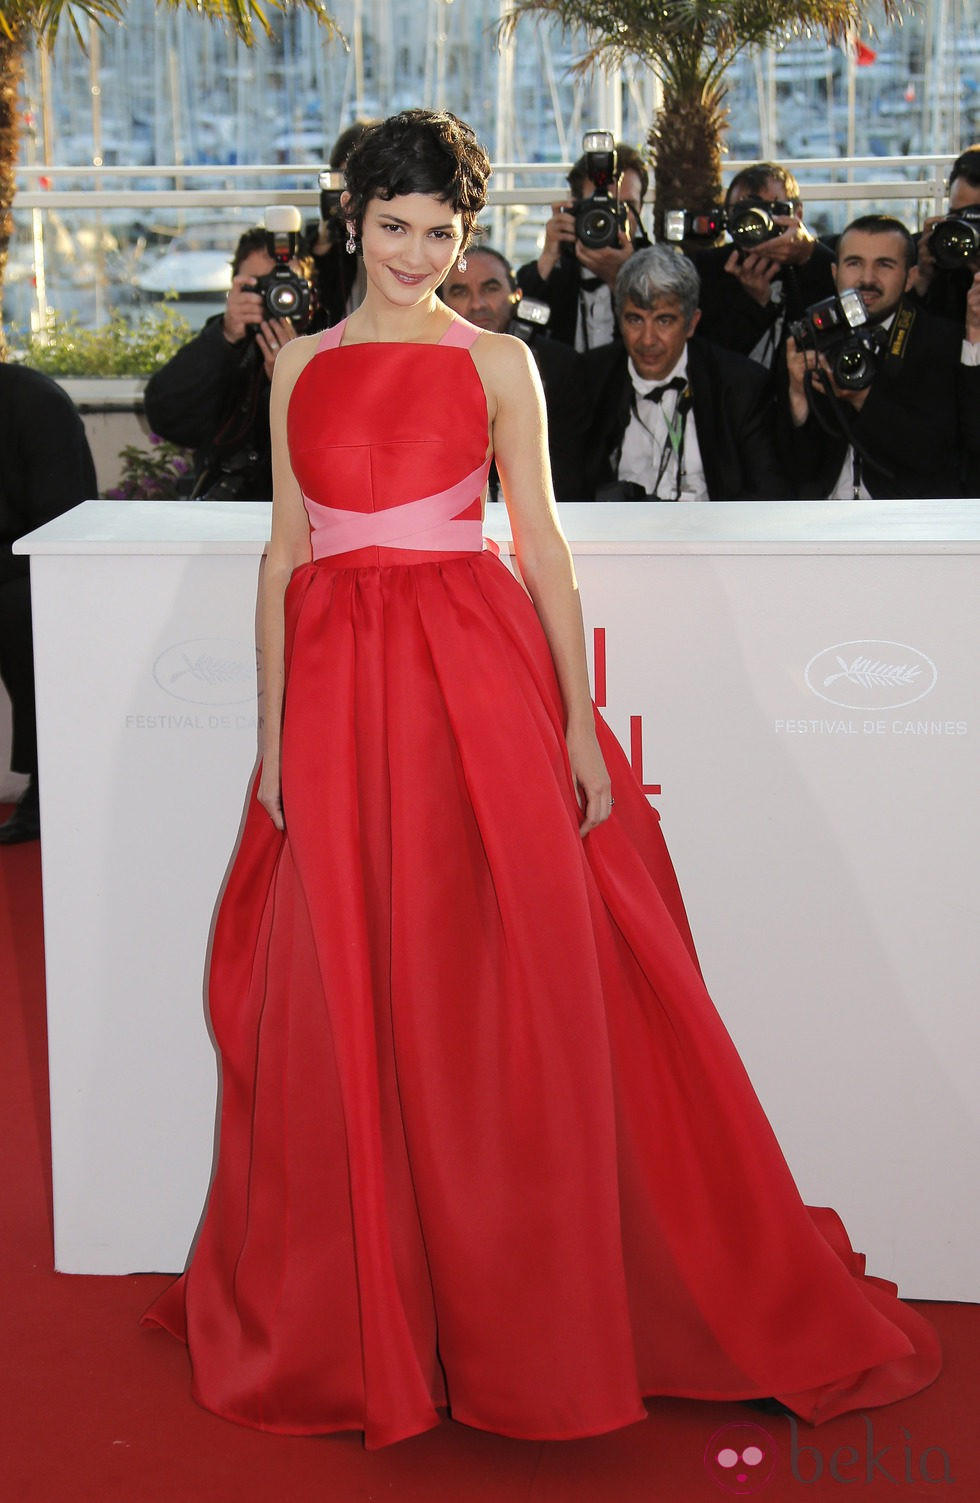 Audrey Tautou en la ceremonia de clausura de Cannes 2013